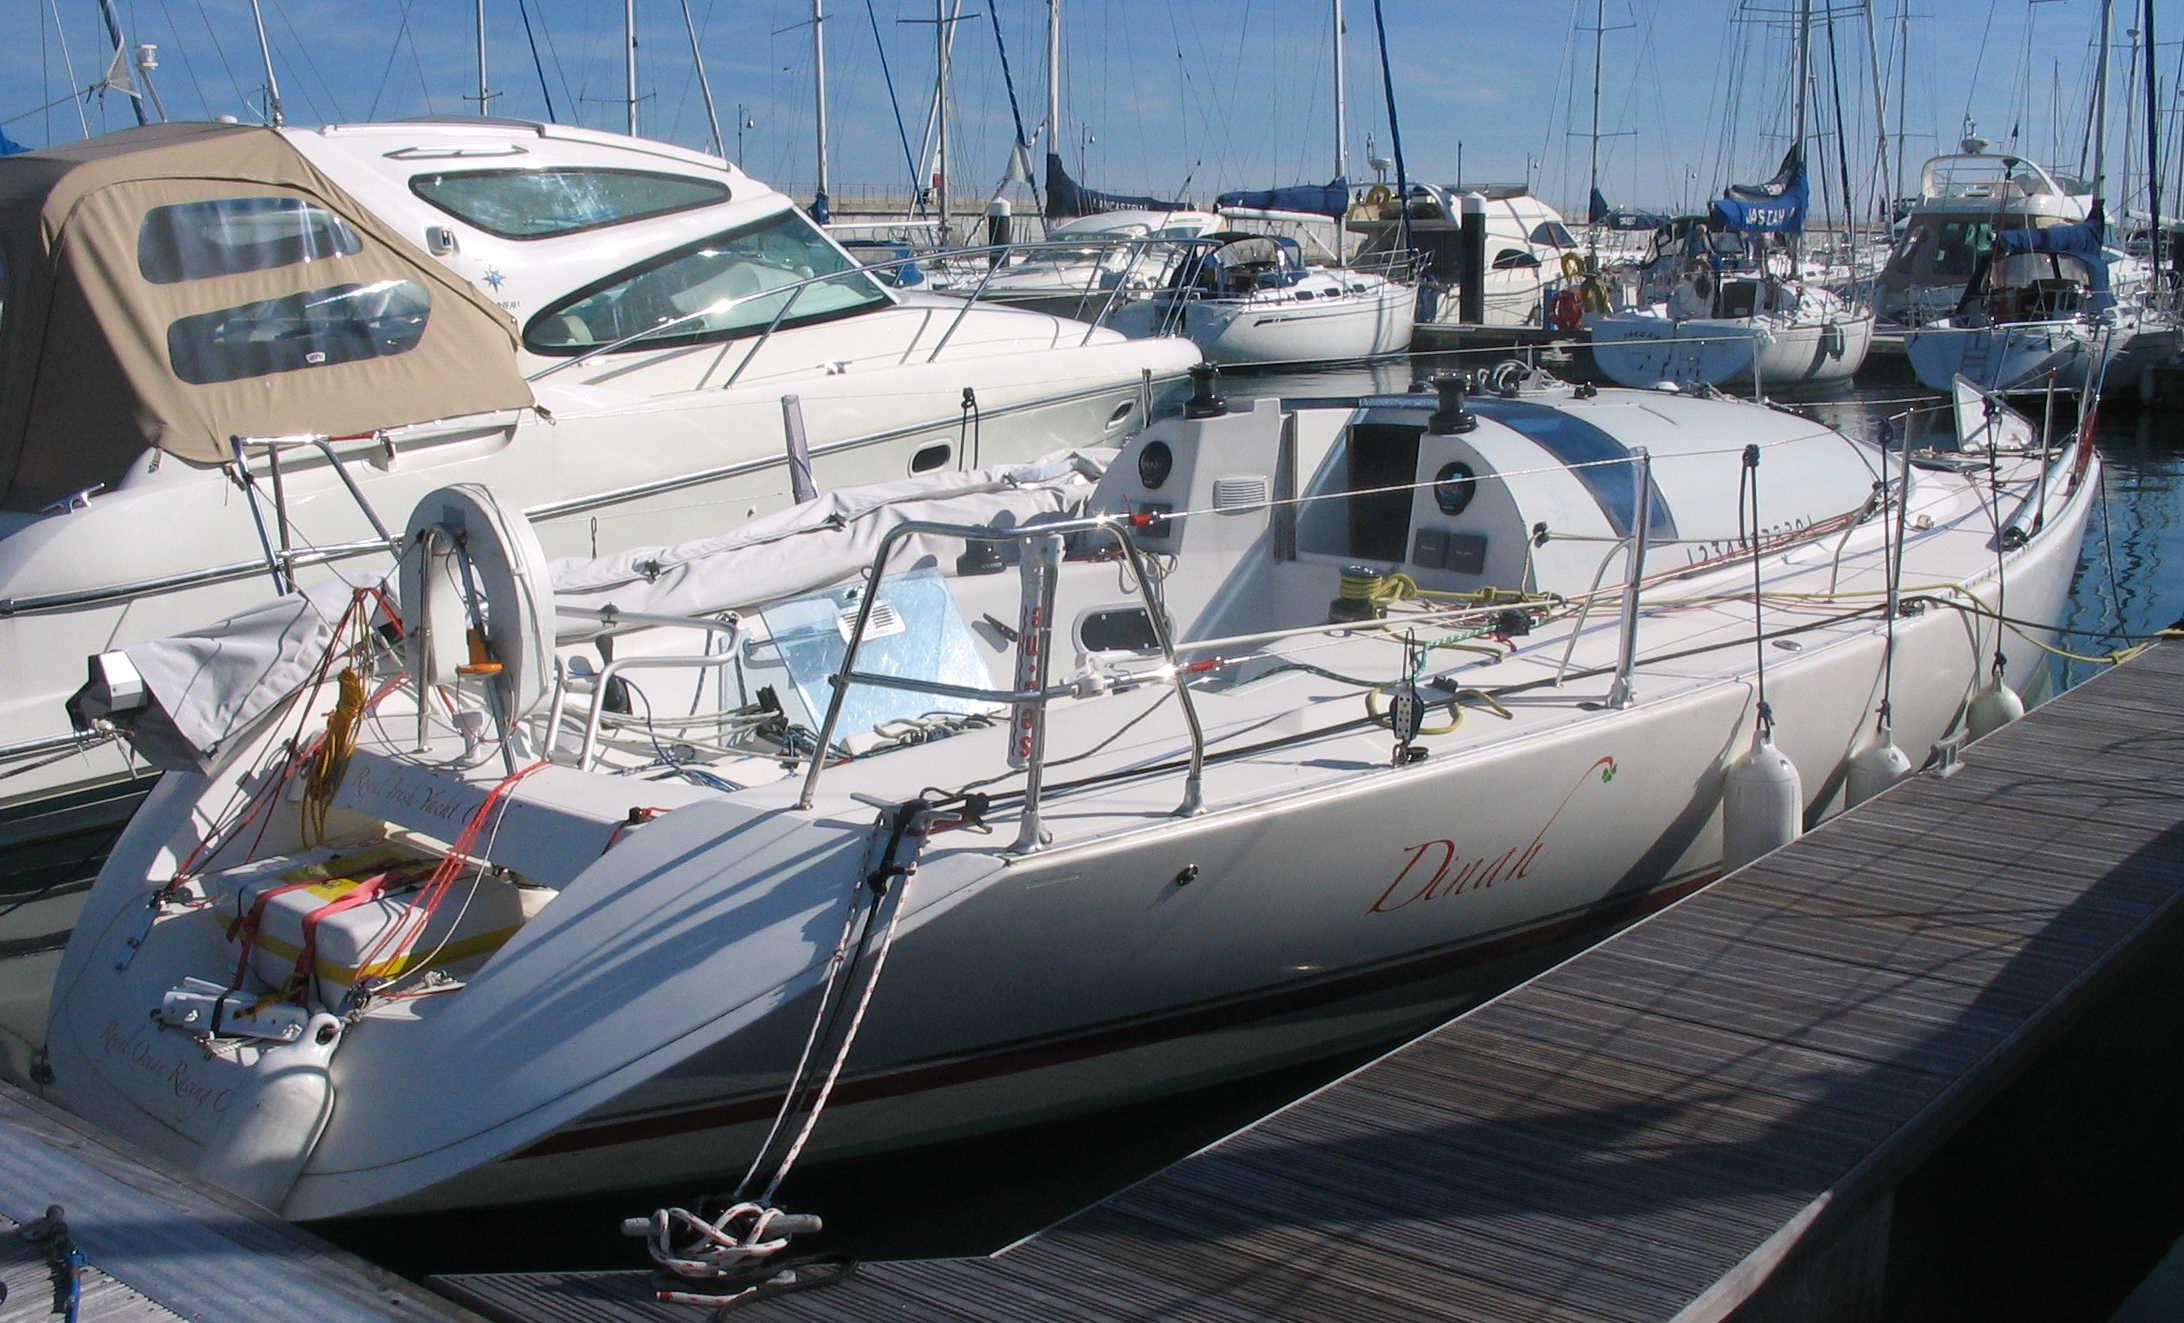 Dinah the Motor Boat